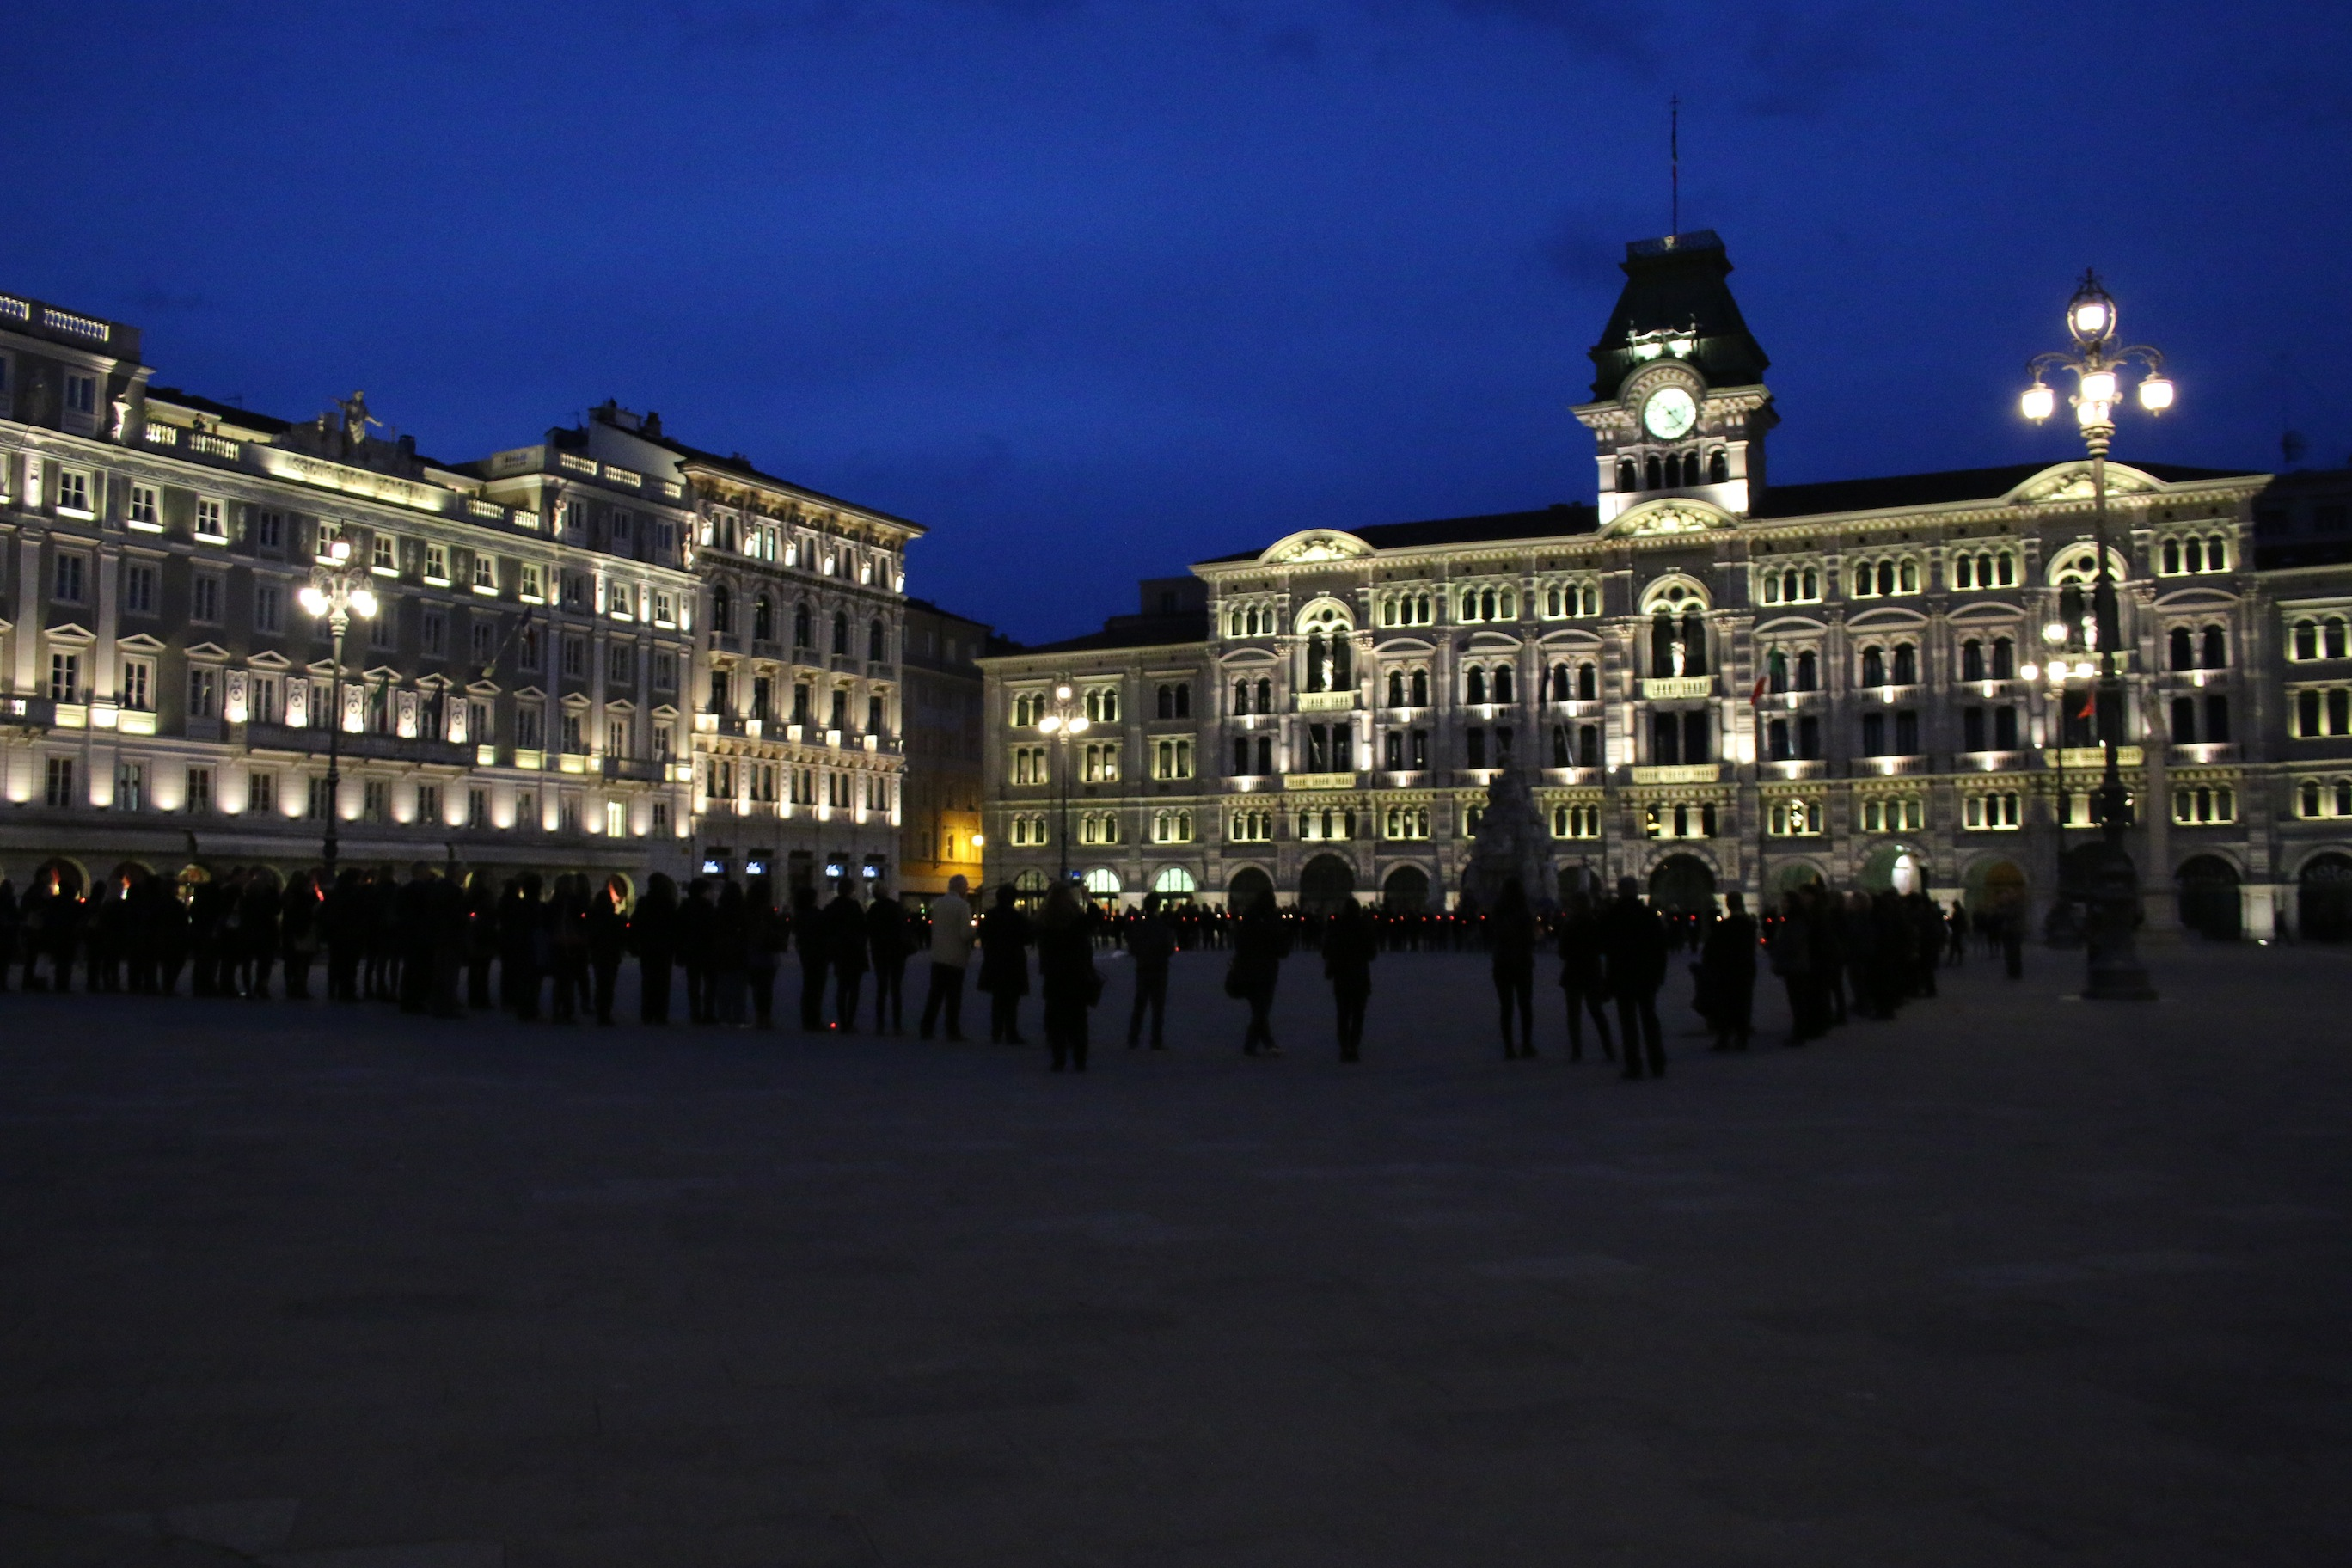 Rifondazione a Trieste - Prenova v Trstu - Partito Comunista